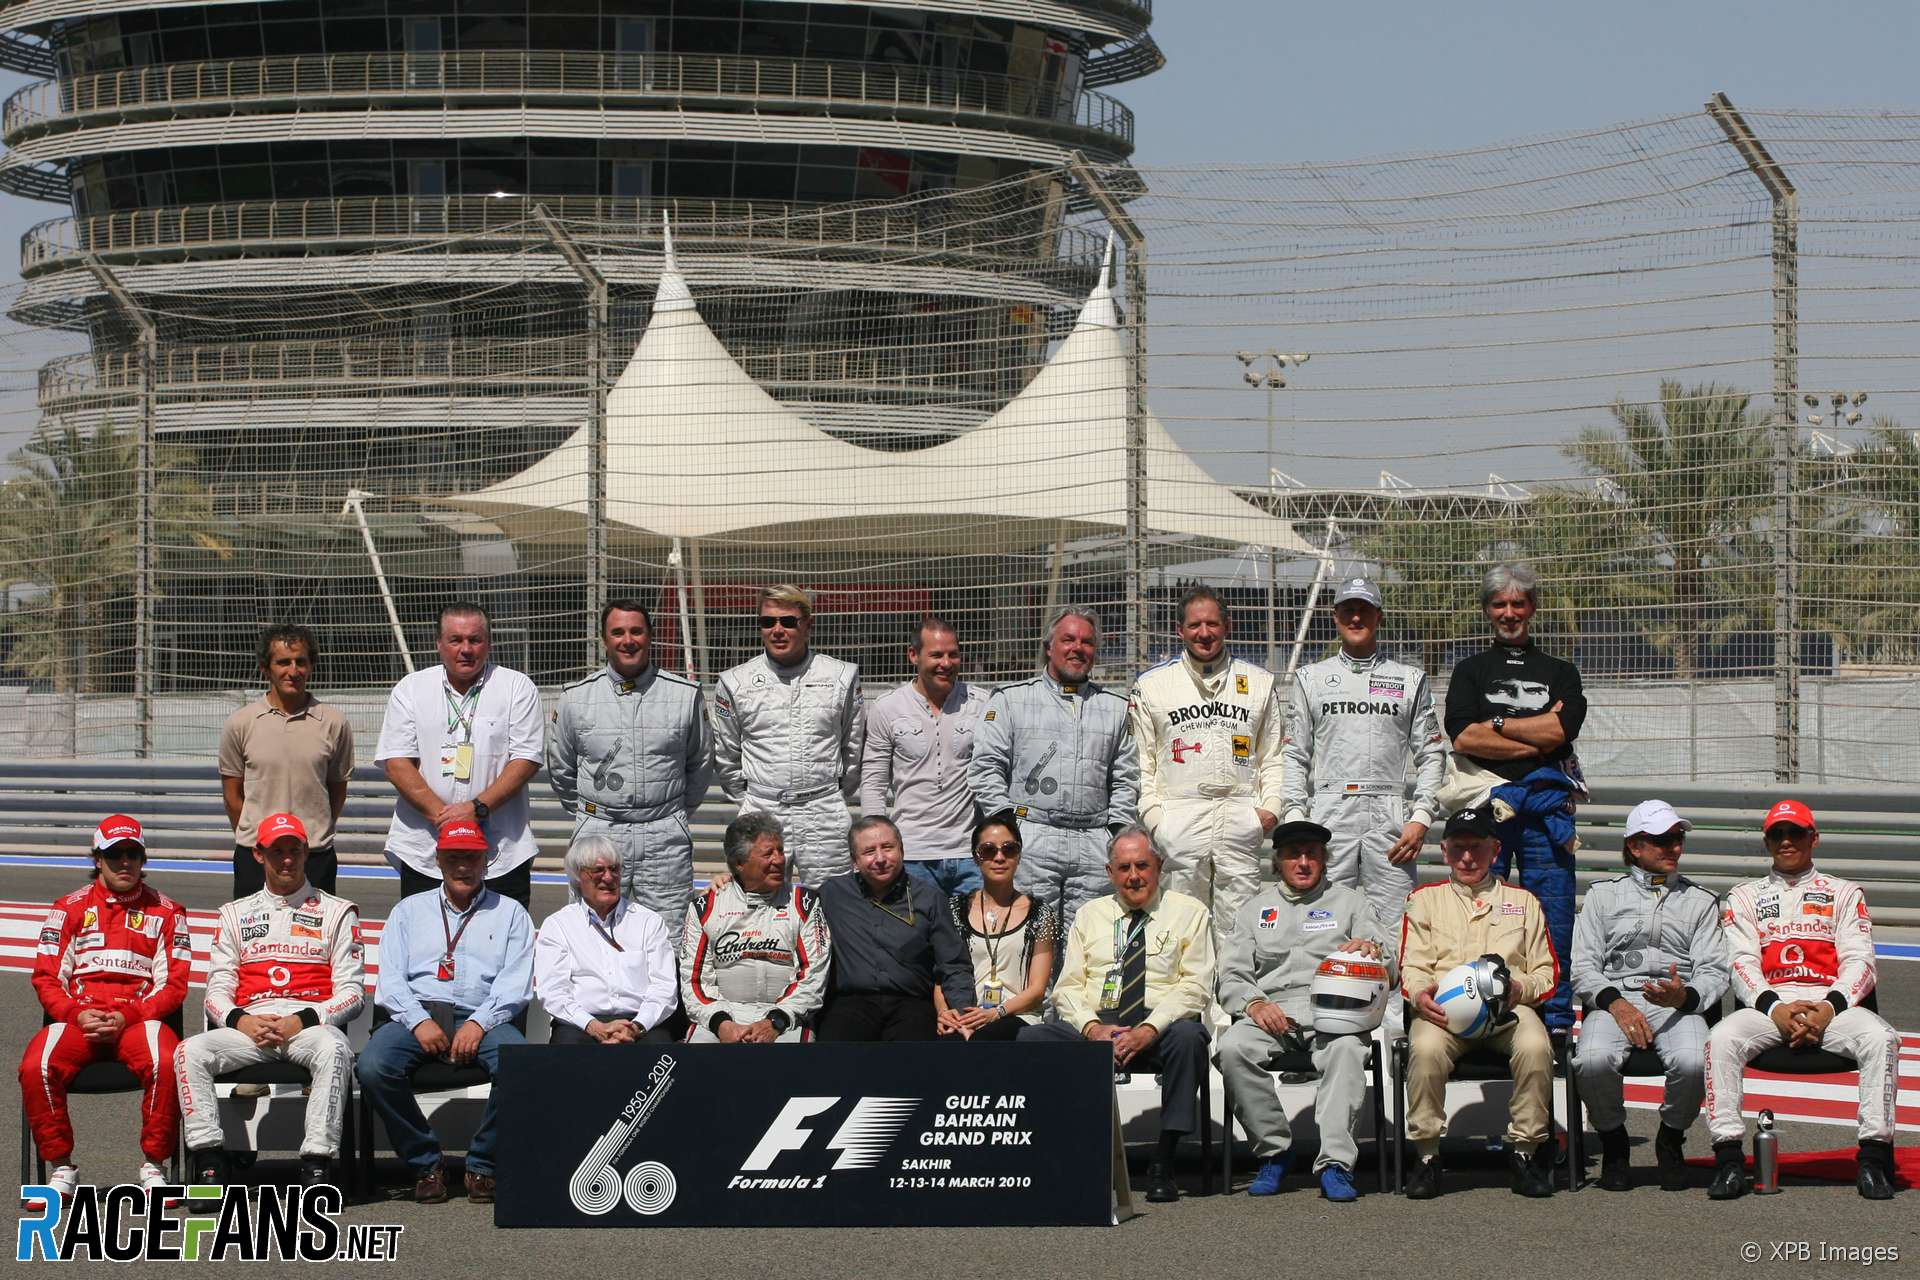 F1 world champions in Bahrain, 2010